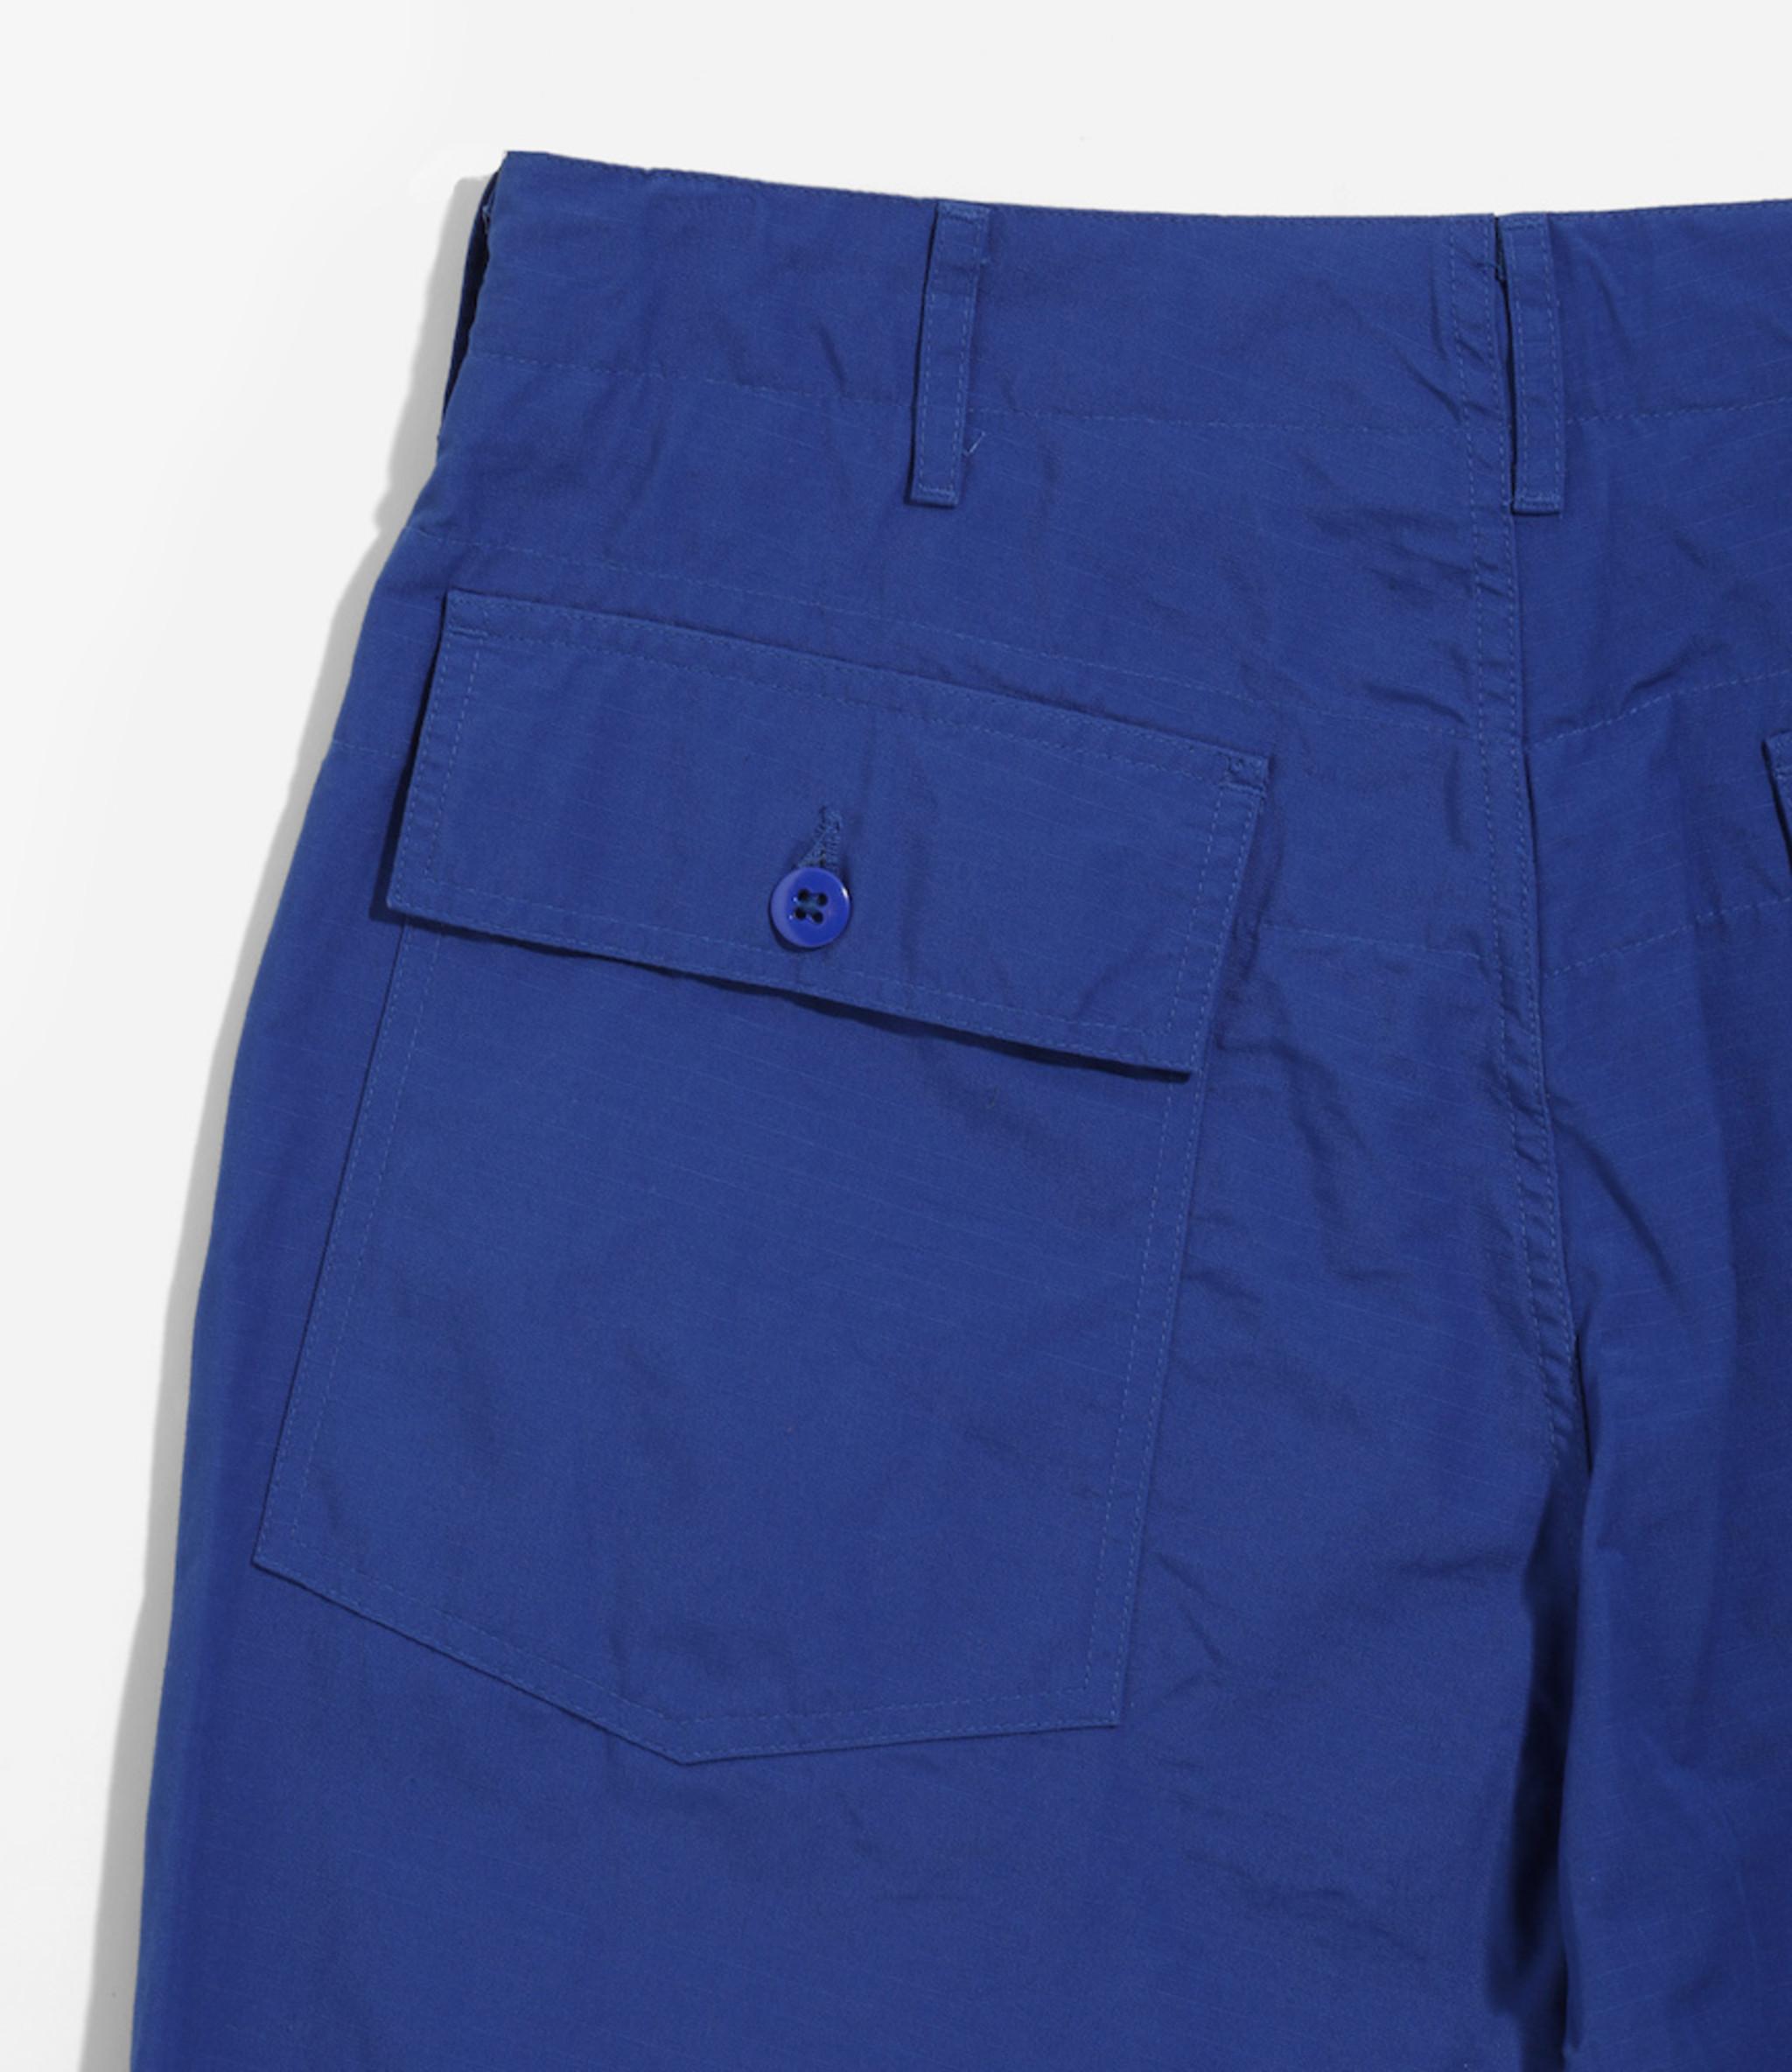 Engineered Garments Fatigue Short - Royal Cotton Ripstop